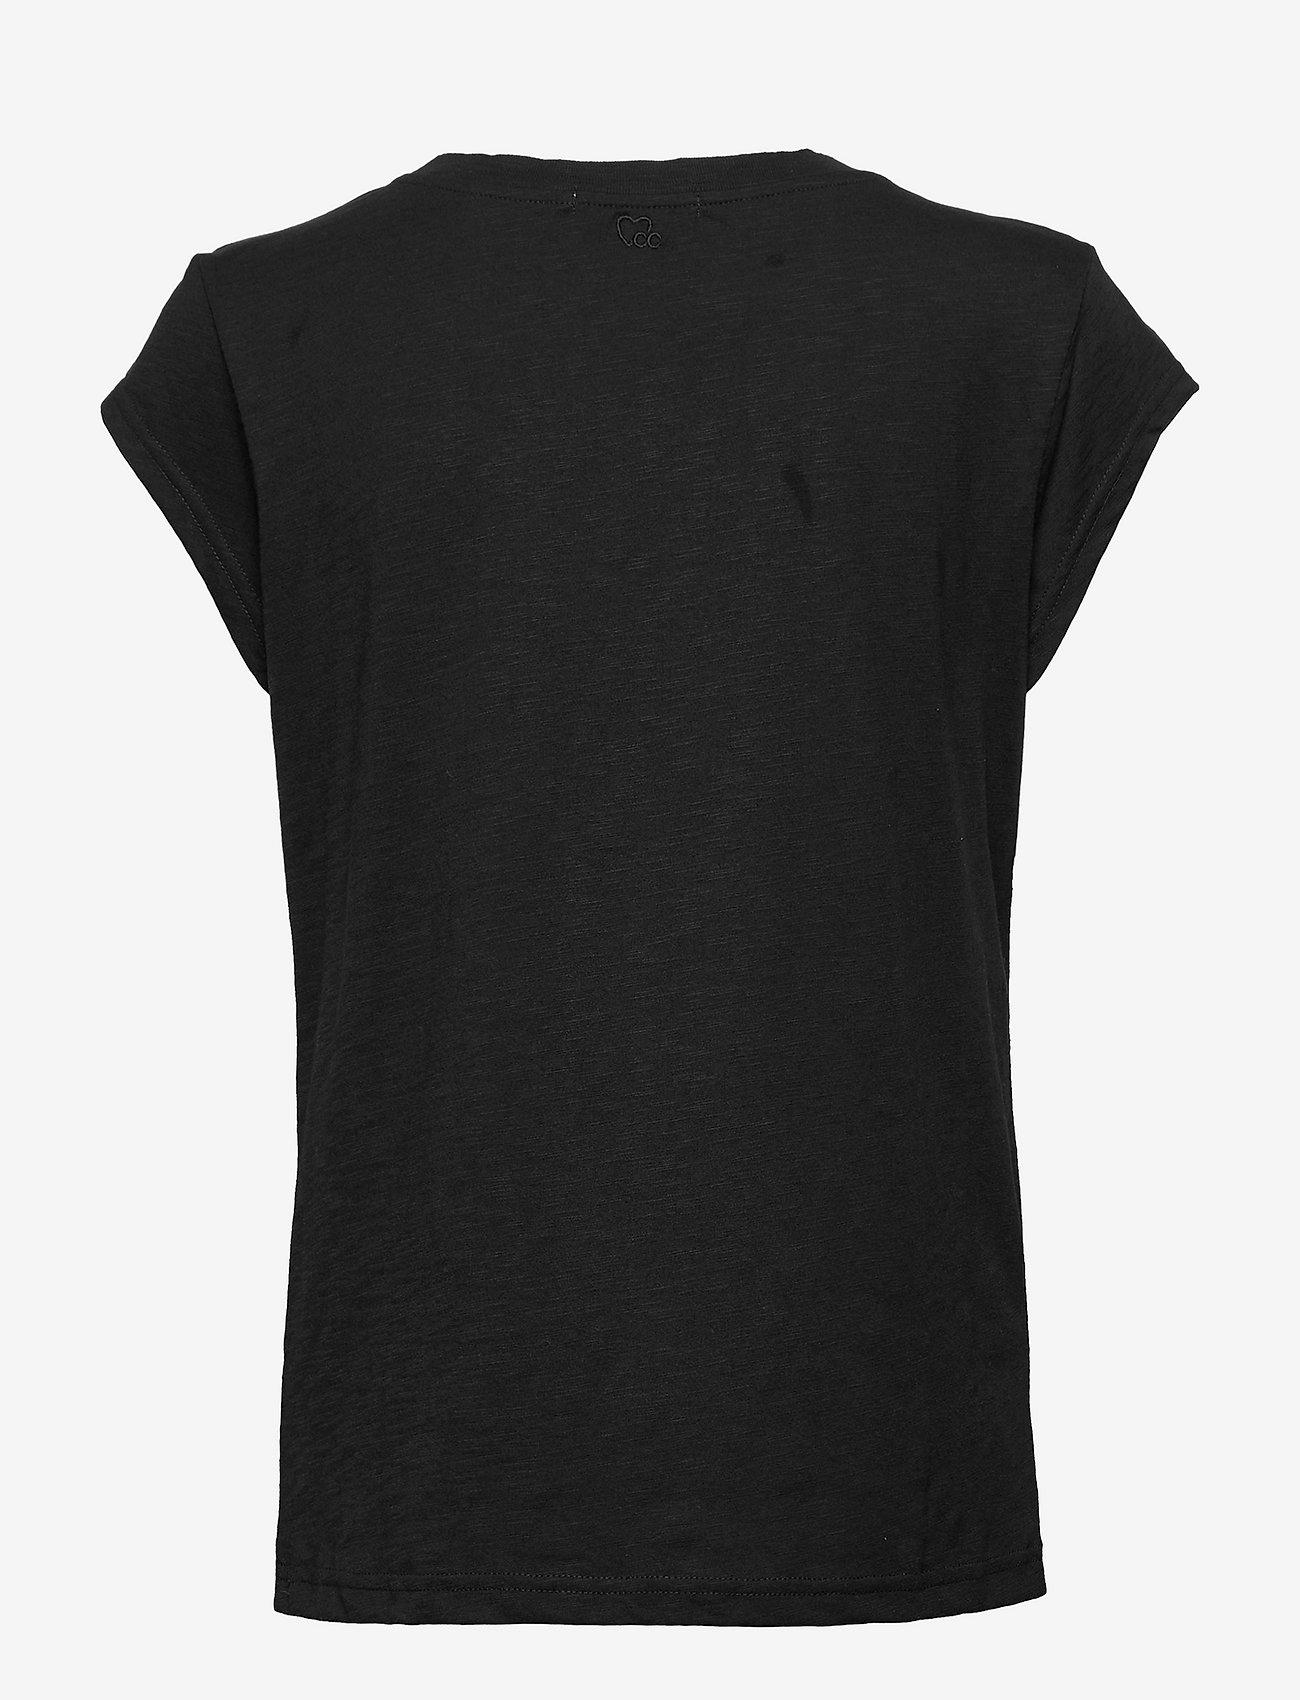 Coster Copenhagen - Basic tee - logo t-shirts - black